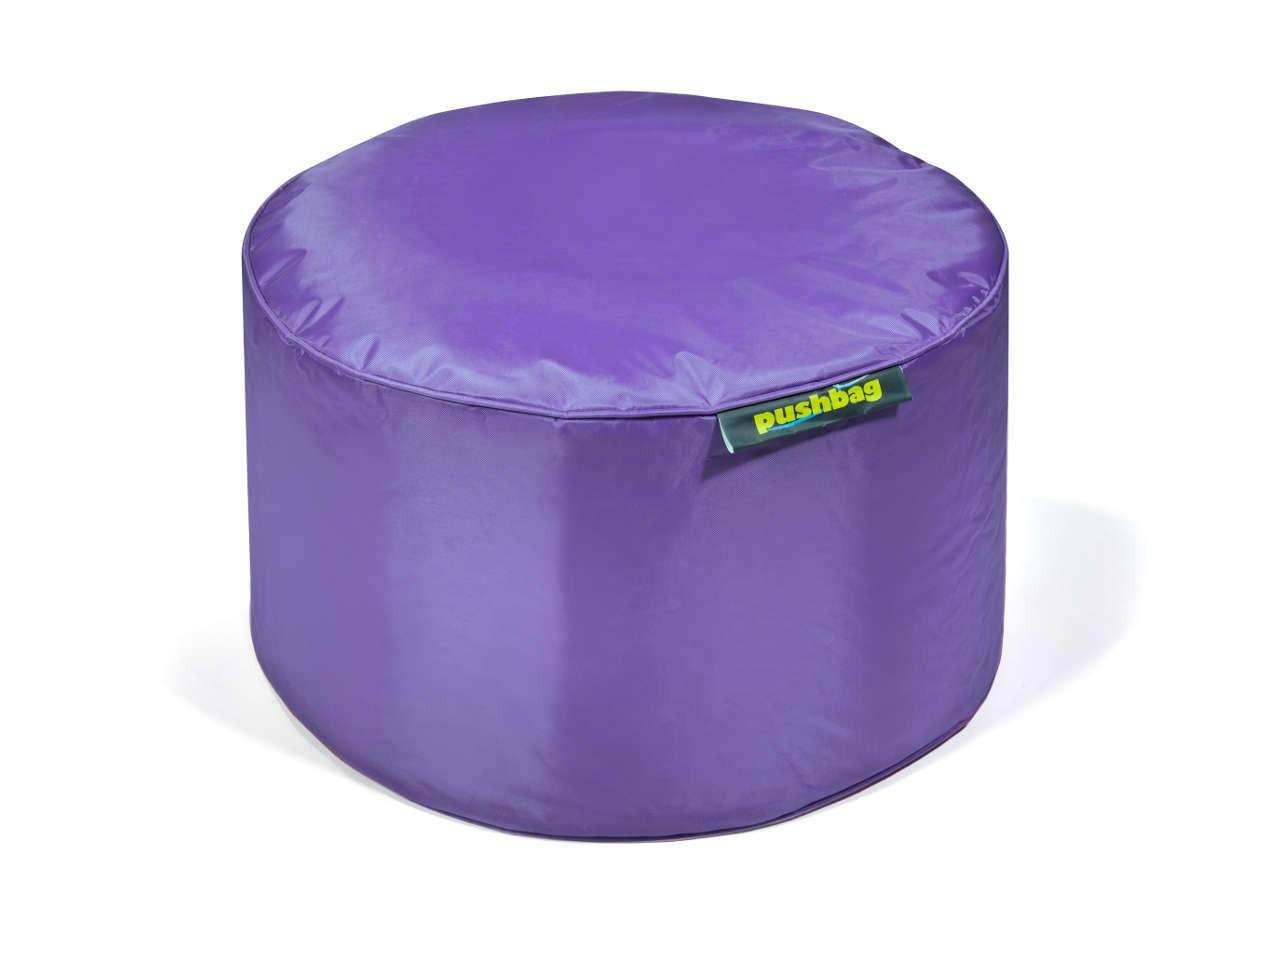 Pushbag Indoor Hocker Drum 11-DRU-OX-purple oxford purple